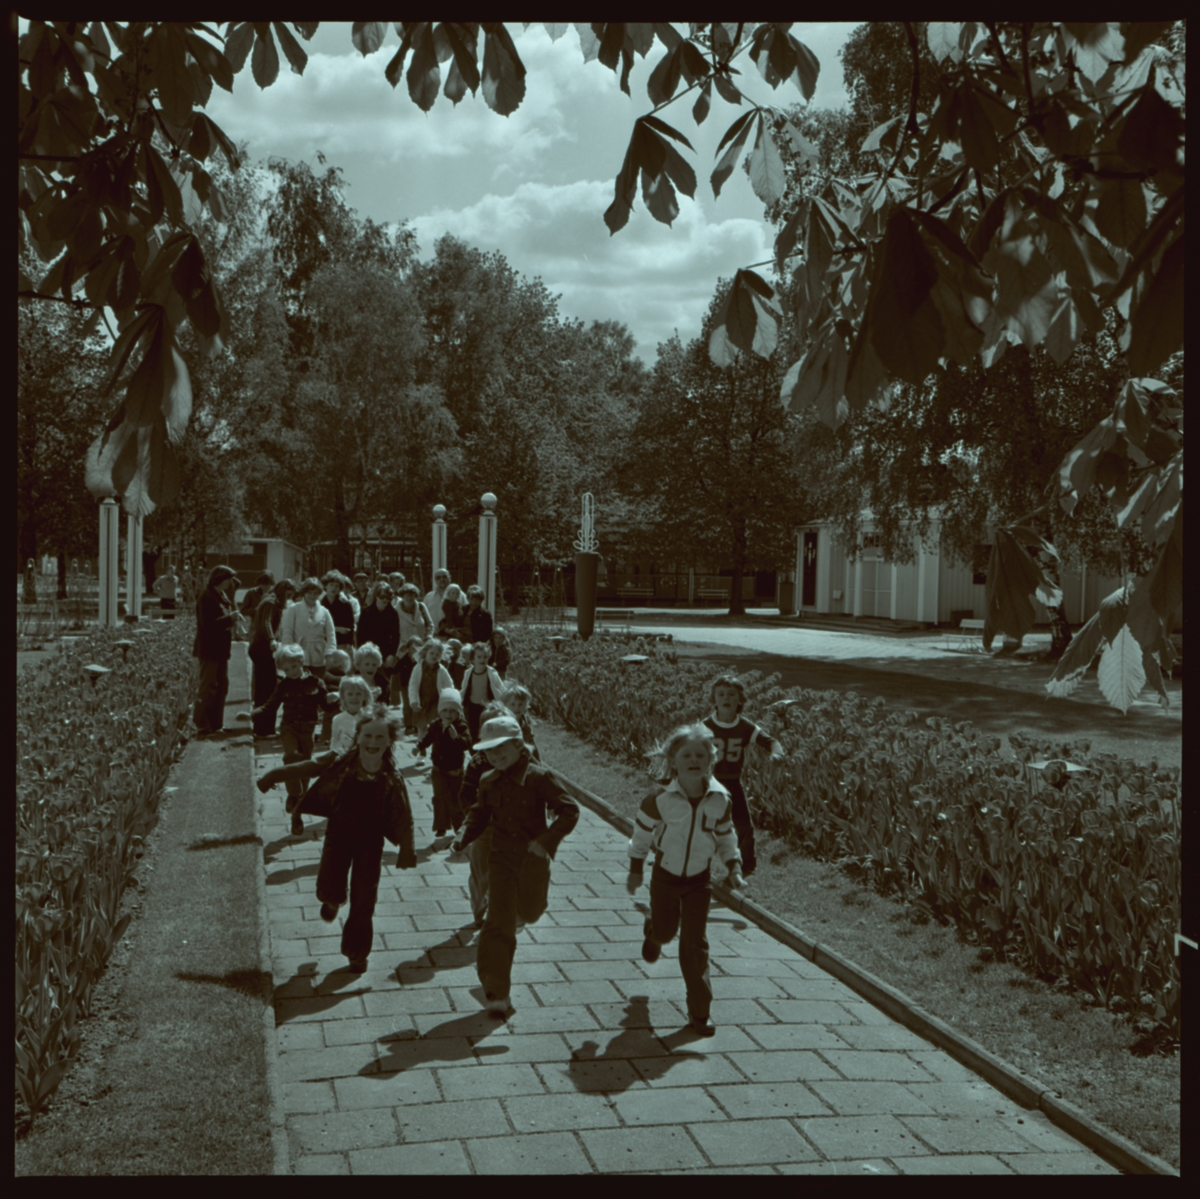 Orig. text: Folkets Park, lekande barn.